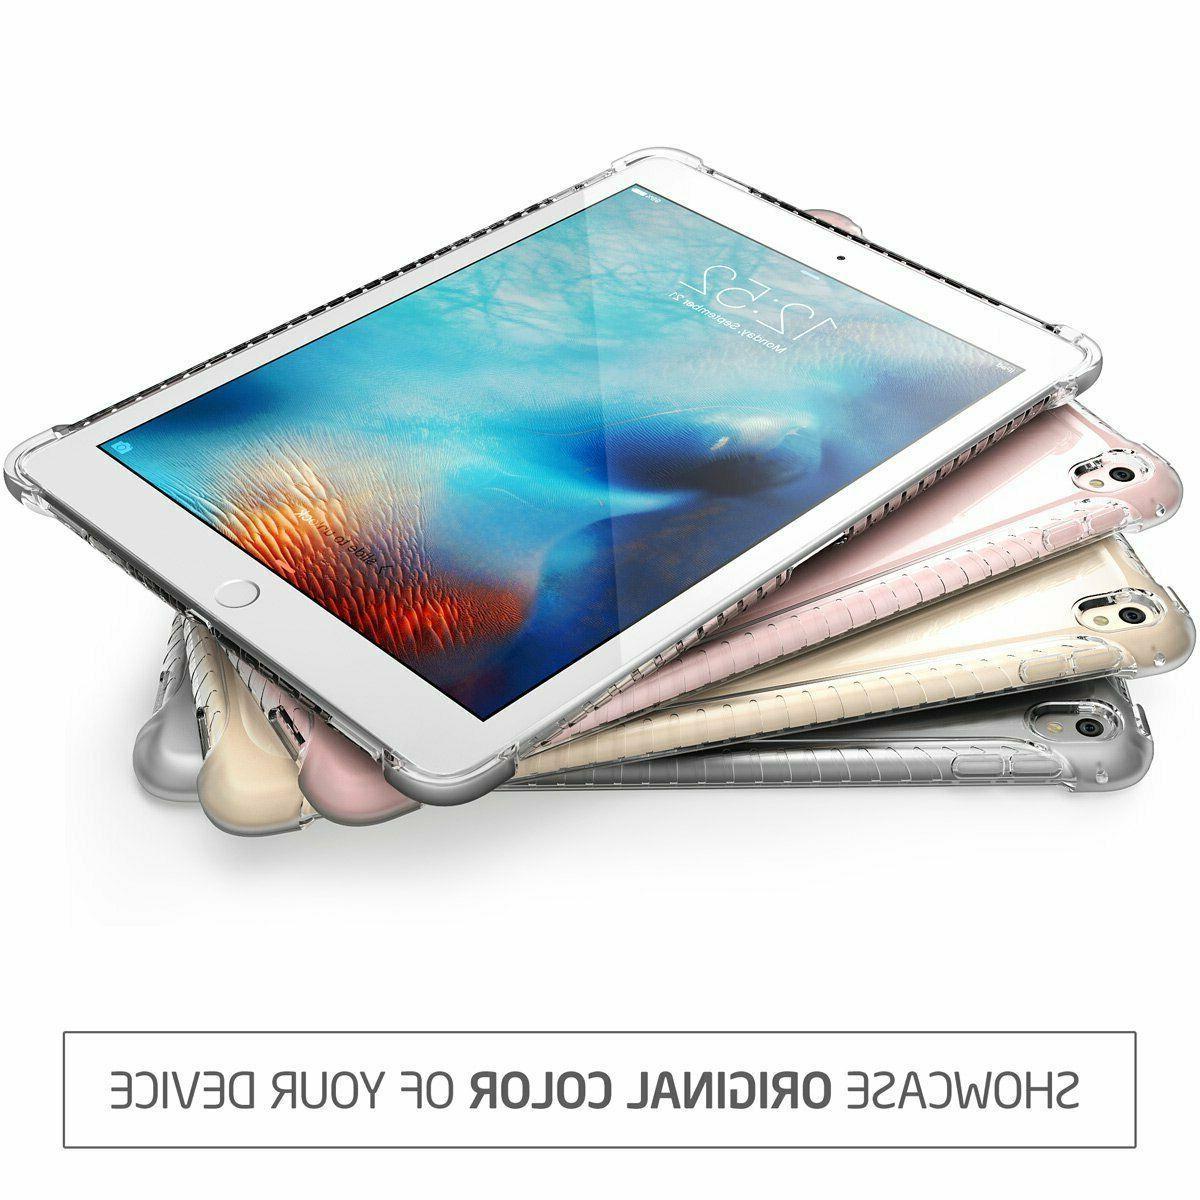 iPad 9.7 Inch Cover SoftGel TPU Protective